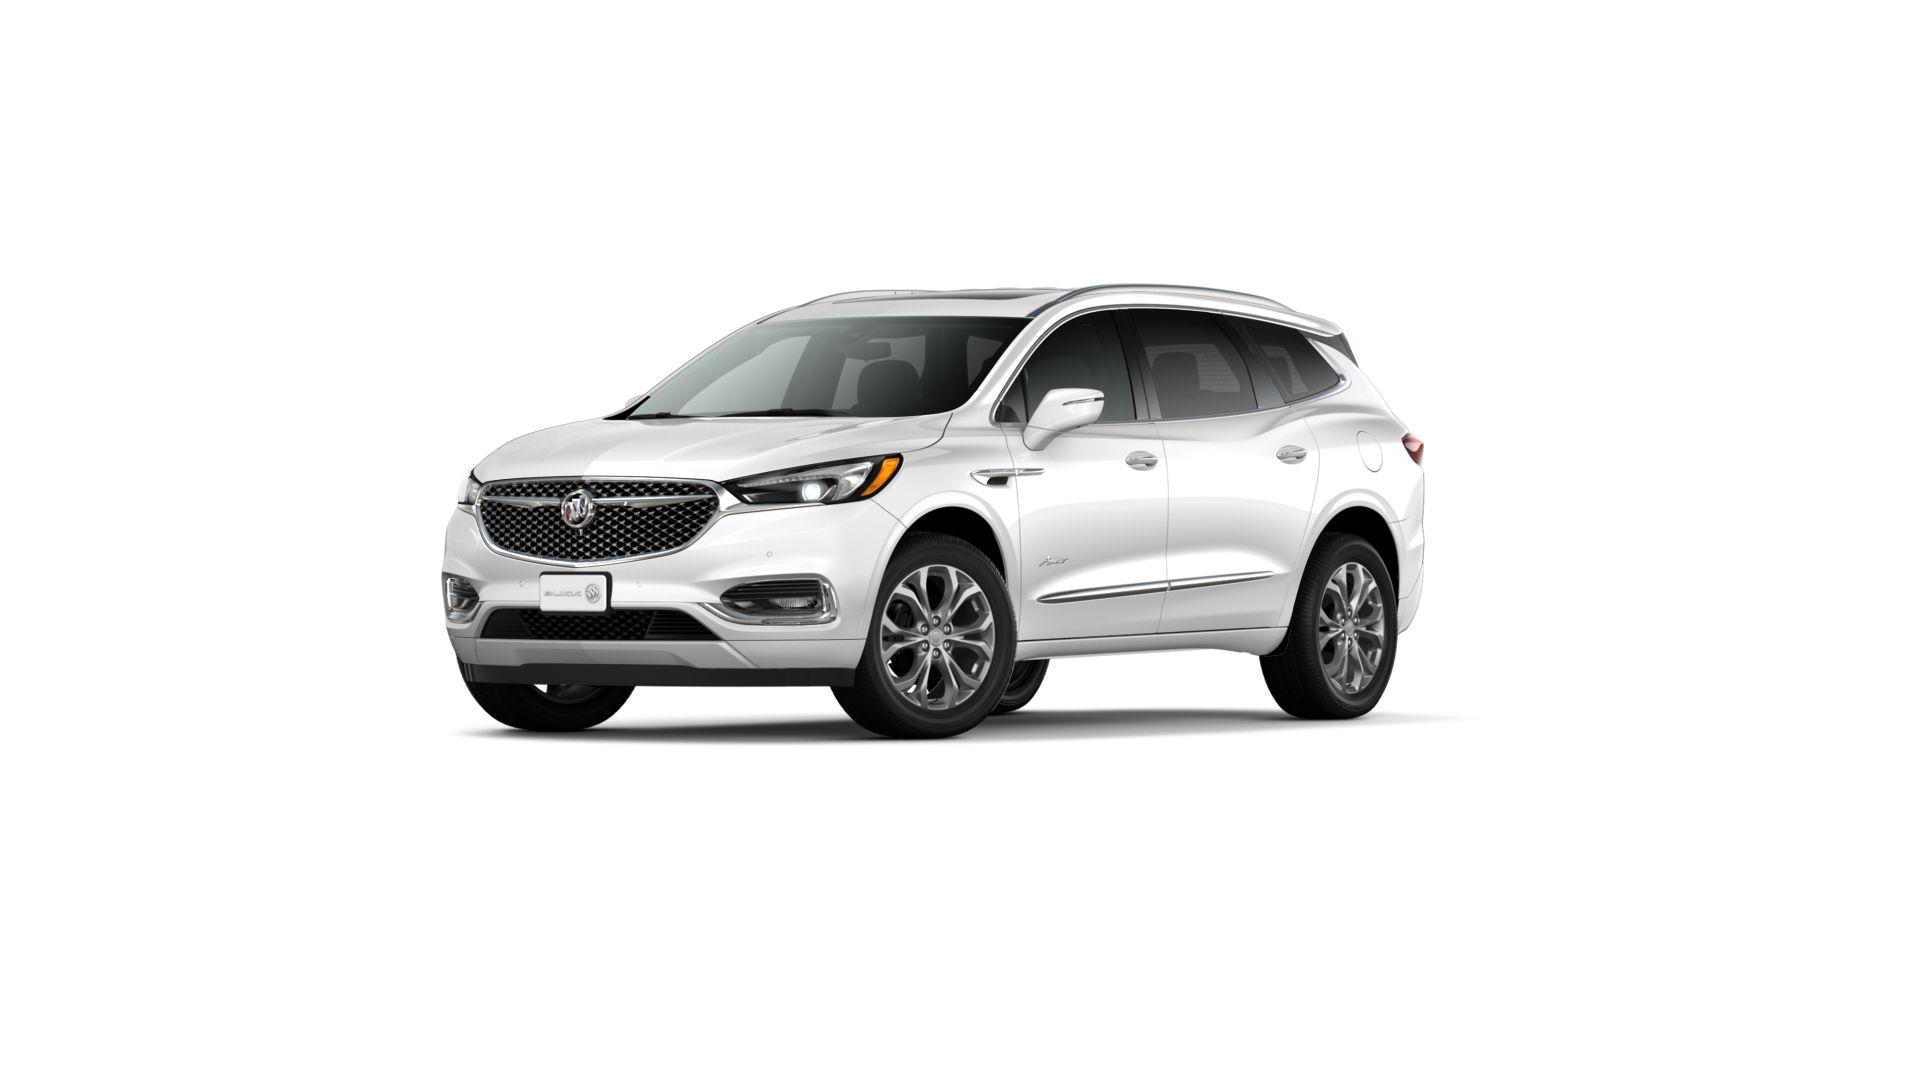 2021 Buick Enclave Prosser WA